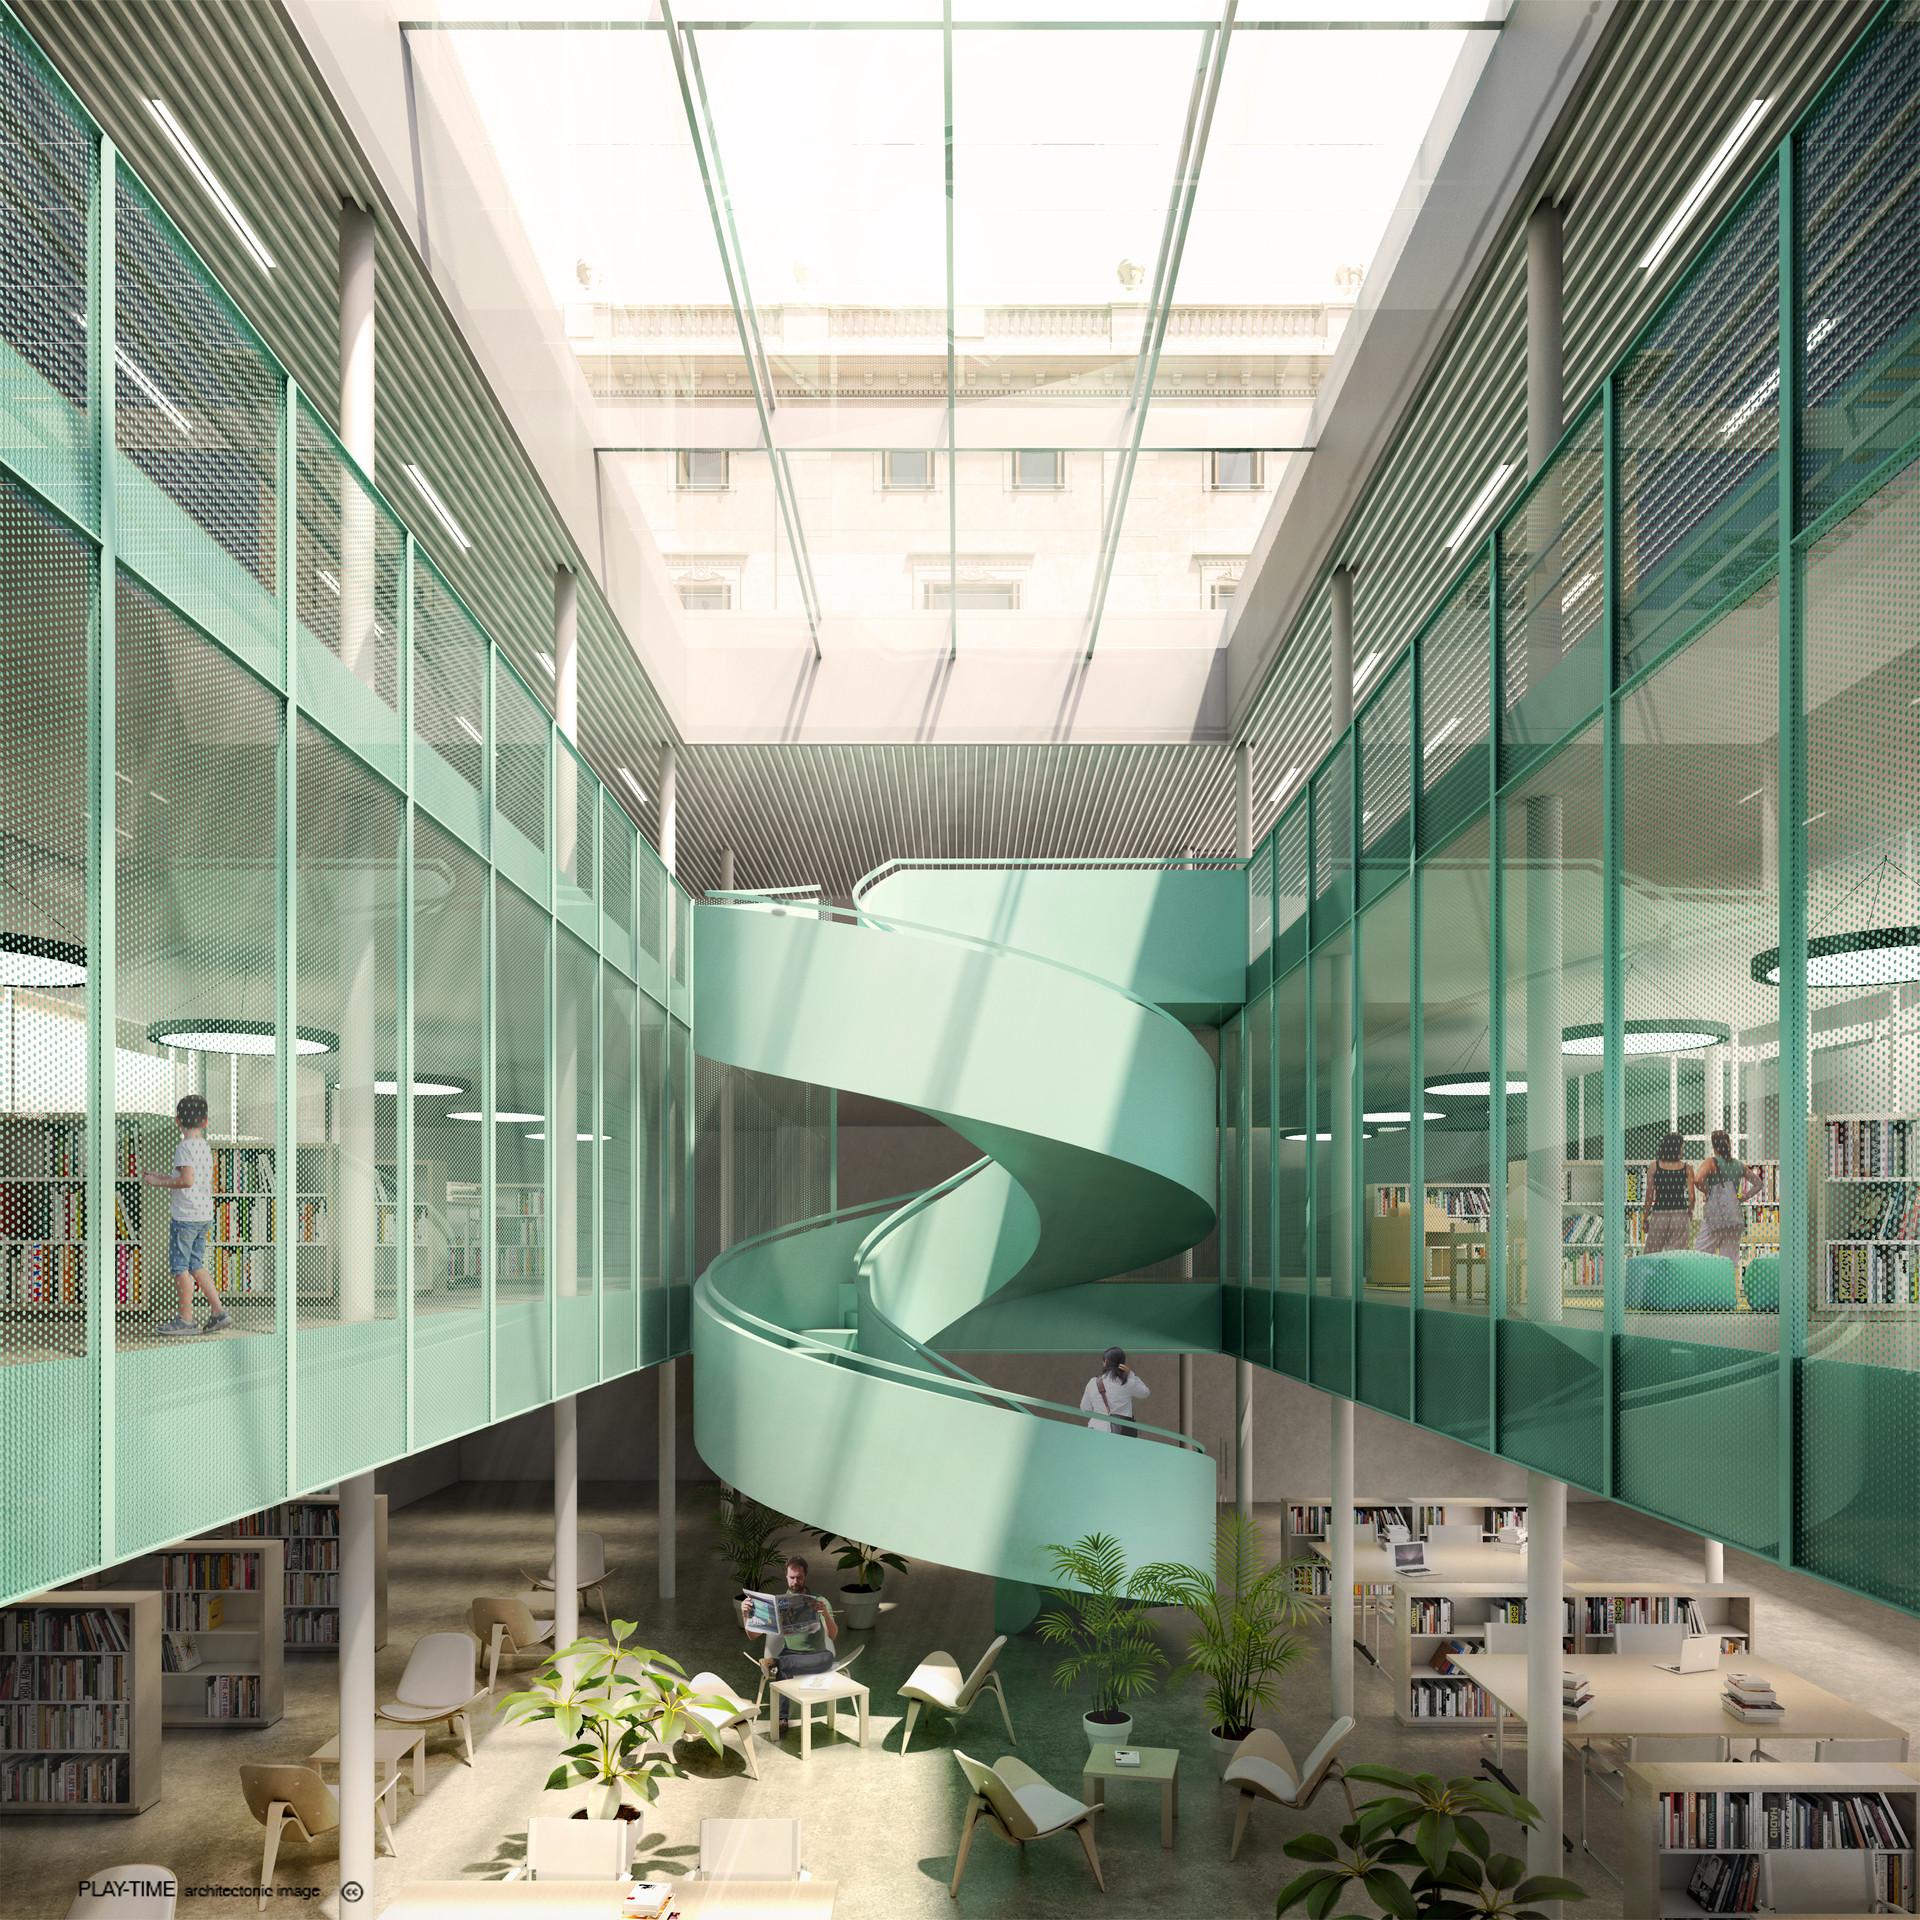 Play time architectonic image interior per publicar